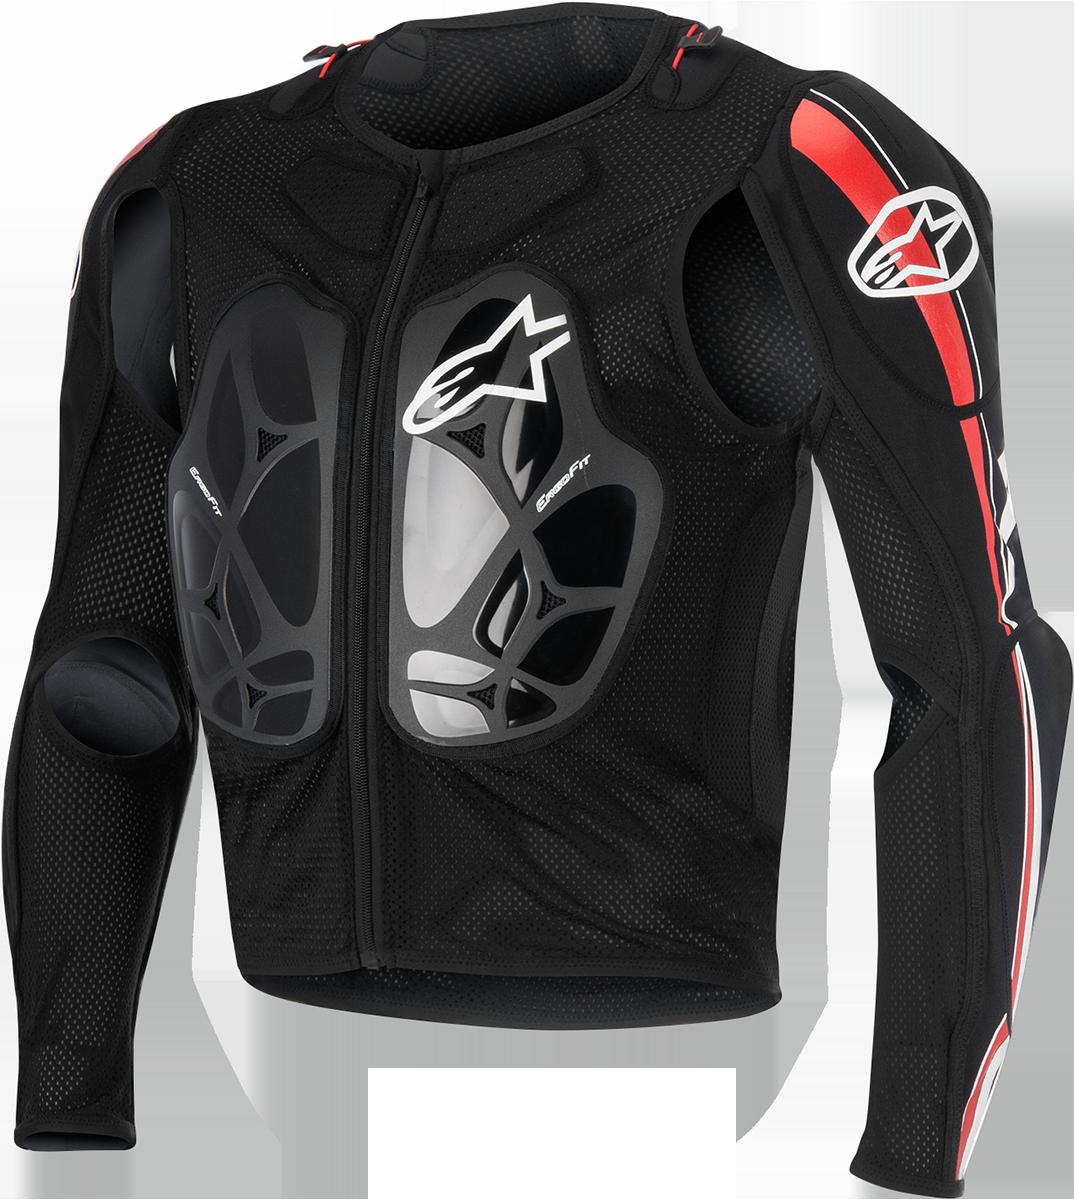 Alpinestars Black Red White Unisex Textile Bionic Pro Off road Dirt Bike Jacket